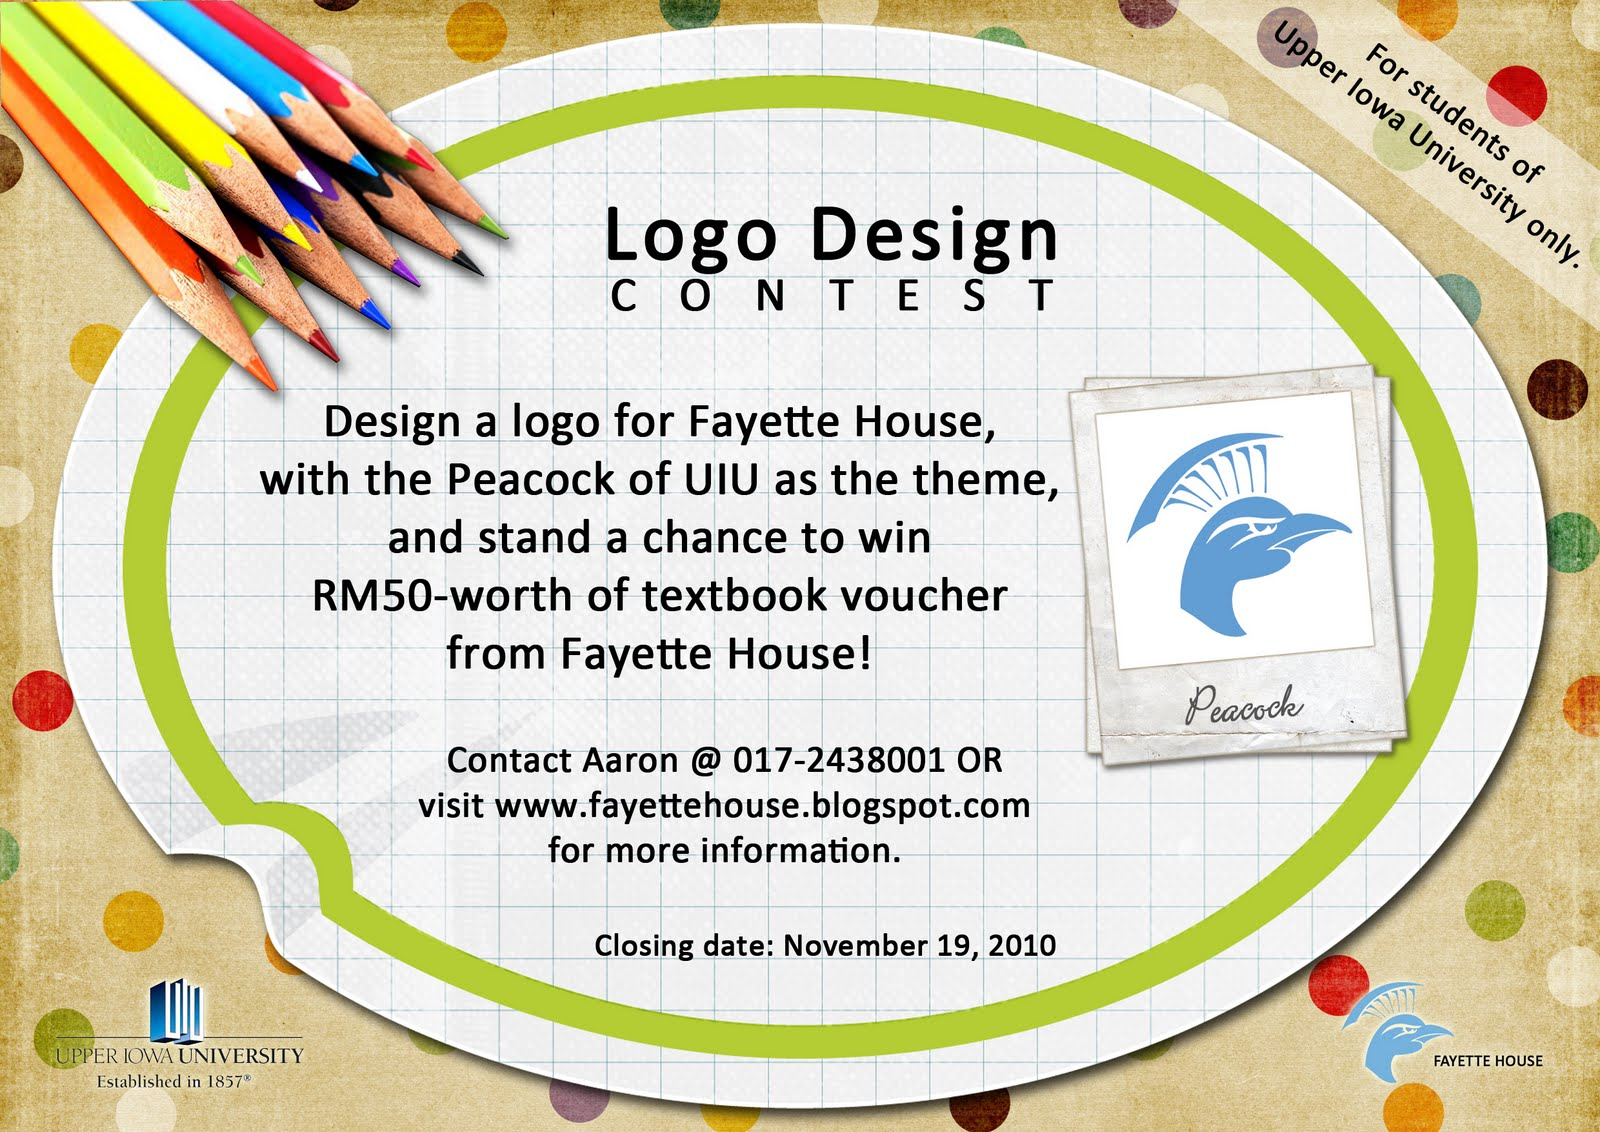 fayette house subang jaya logo design contest rules. Black Bedroom Furniture Sets. Home Design Ideas